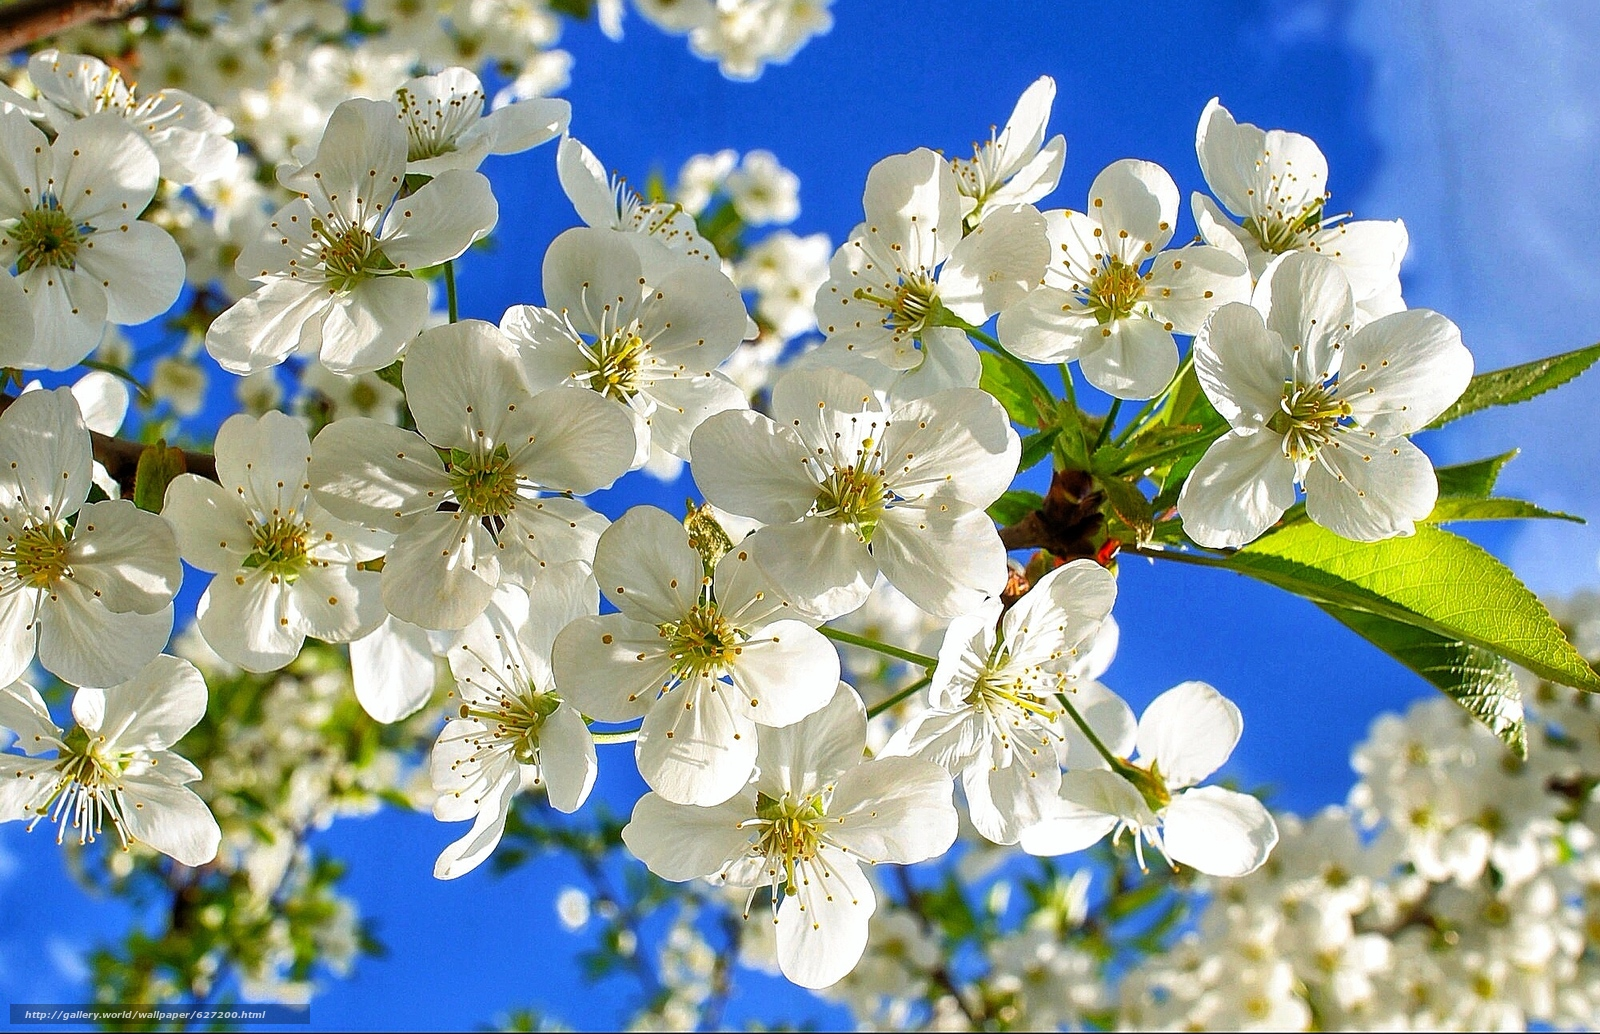 Скачать на телефон обои фото картинку на тему Cherry, ветки, цветы, небо, флора, разширение 2001x1293